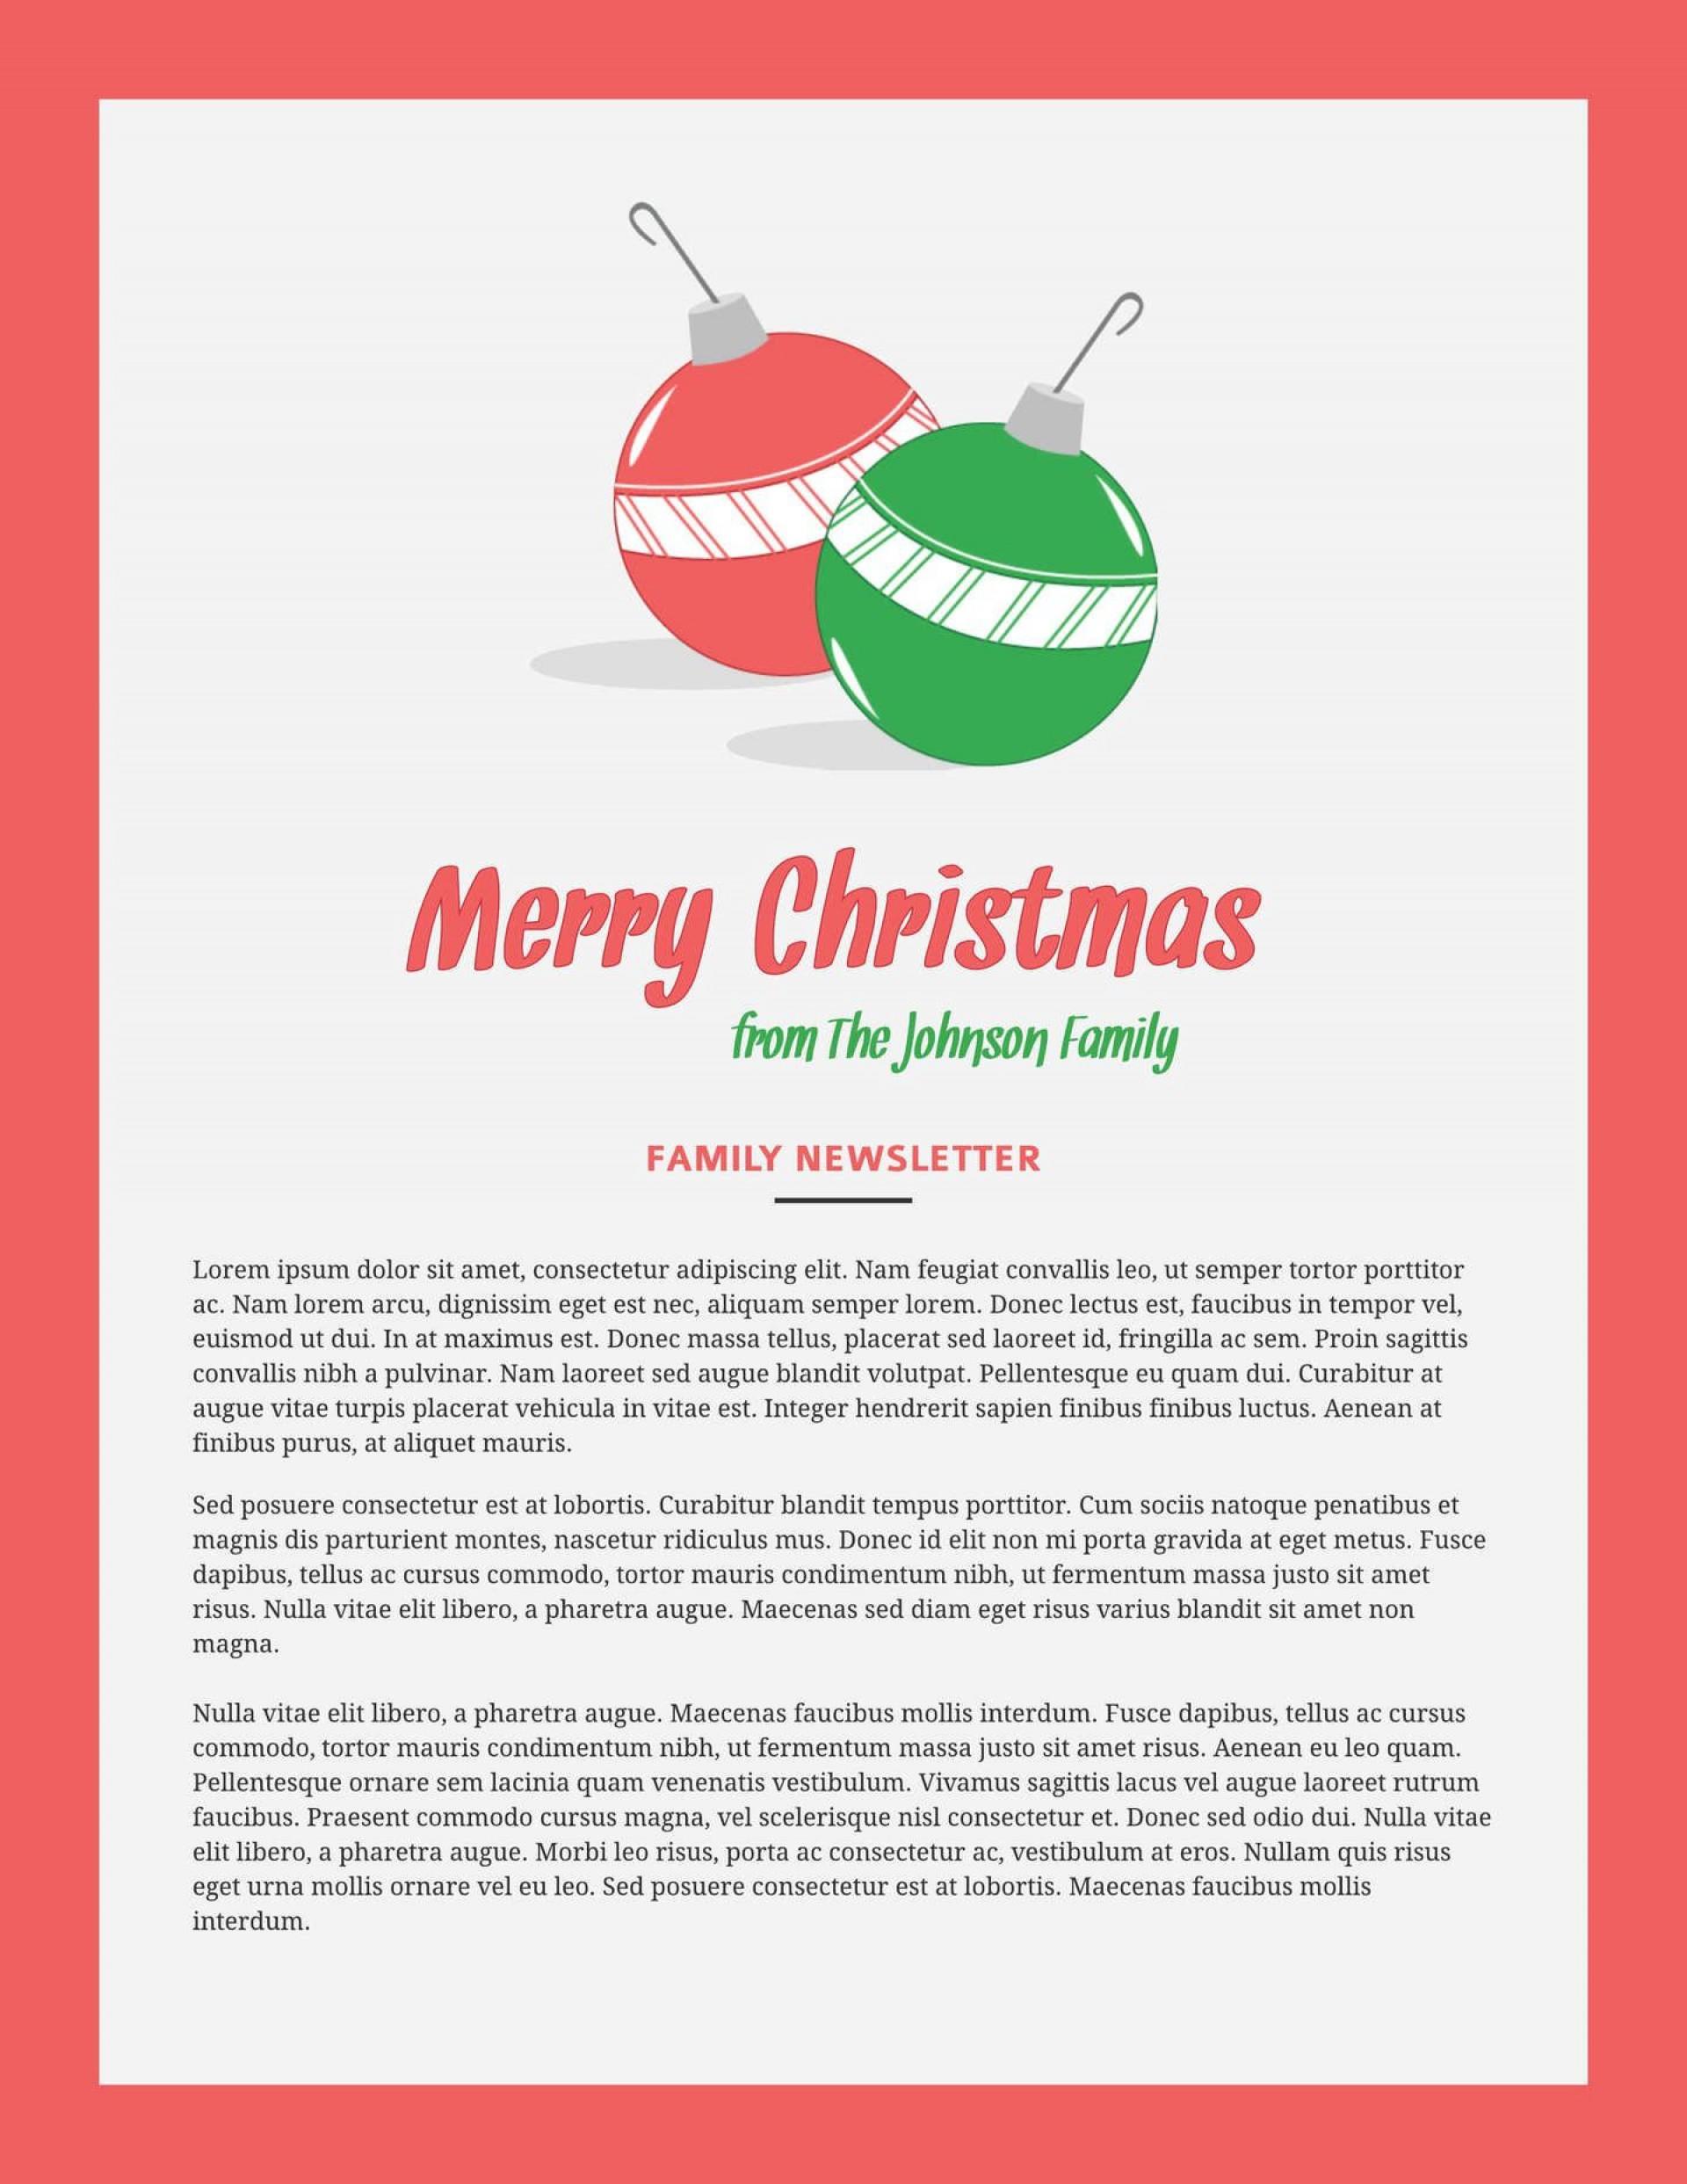 007 Impressive Free Christma Newsletter Template Microsoft Word High Resolution 1920